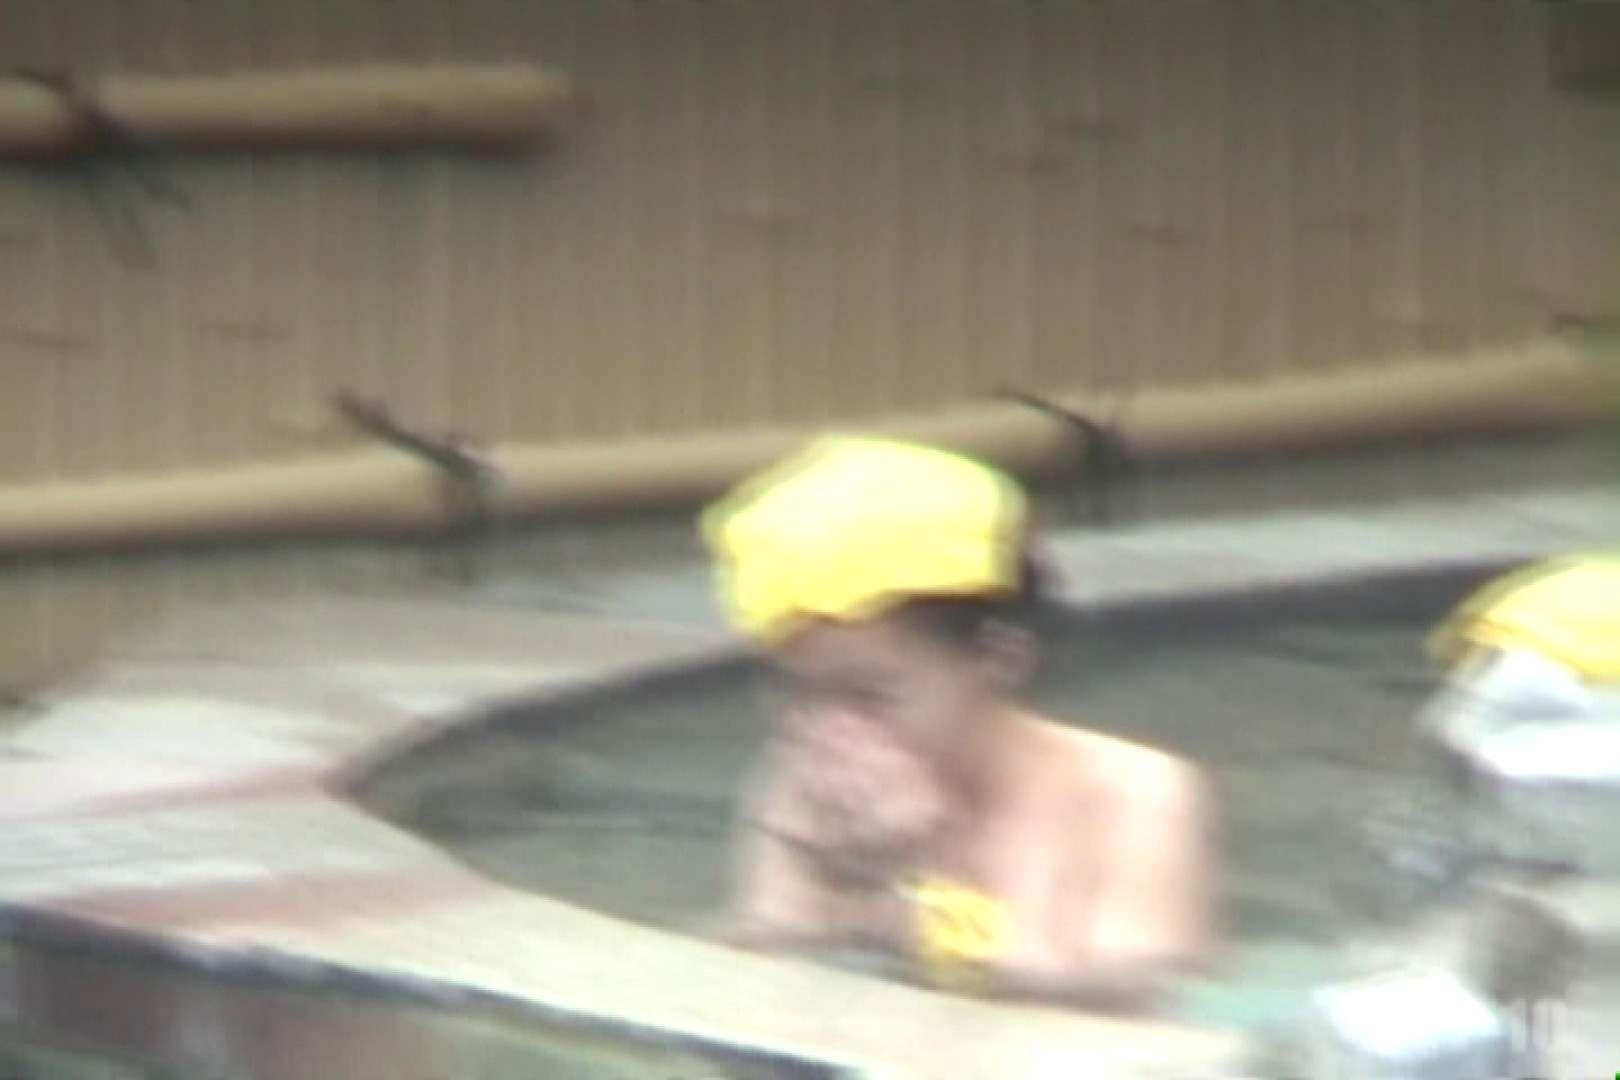 Aquaな露天風呂Vol.795 盗撮師作品 おめこ無修正動画無料 103pic 2